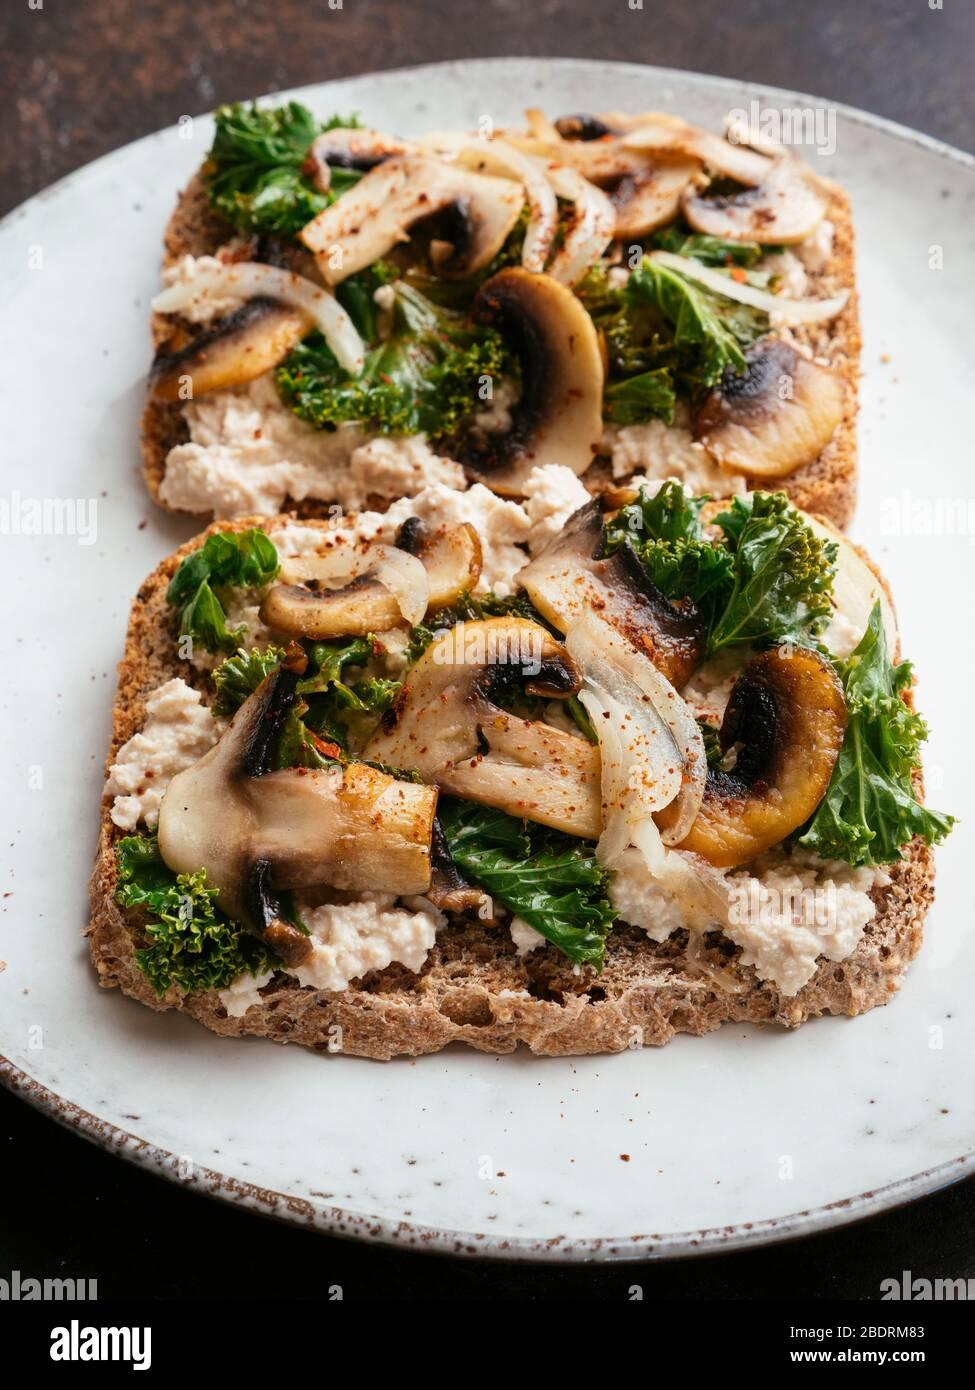 15+ Vegan Ricotta, Mushrooms and Kale on Toast Stock Photo   Alamy Fotografie